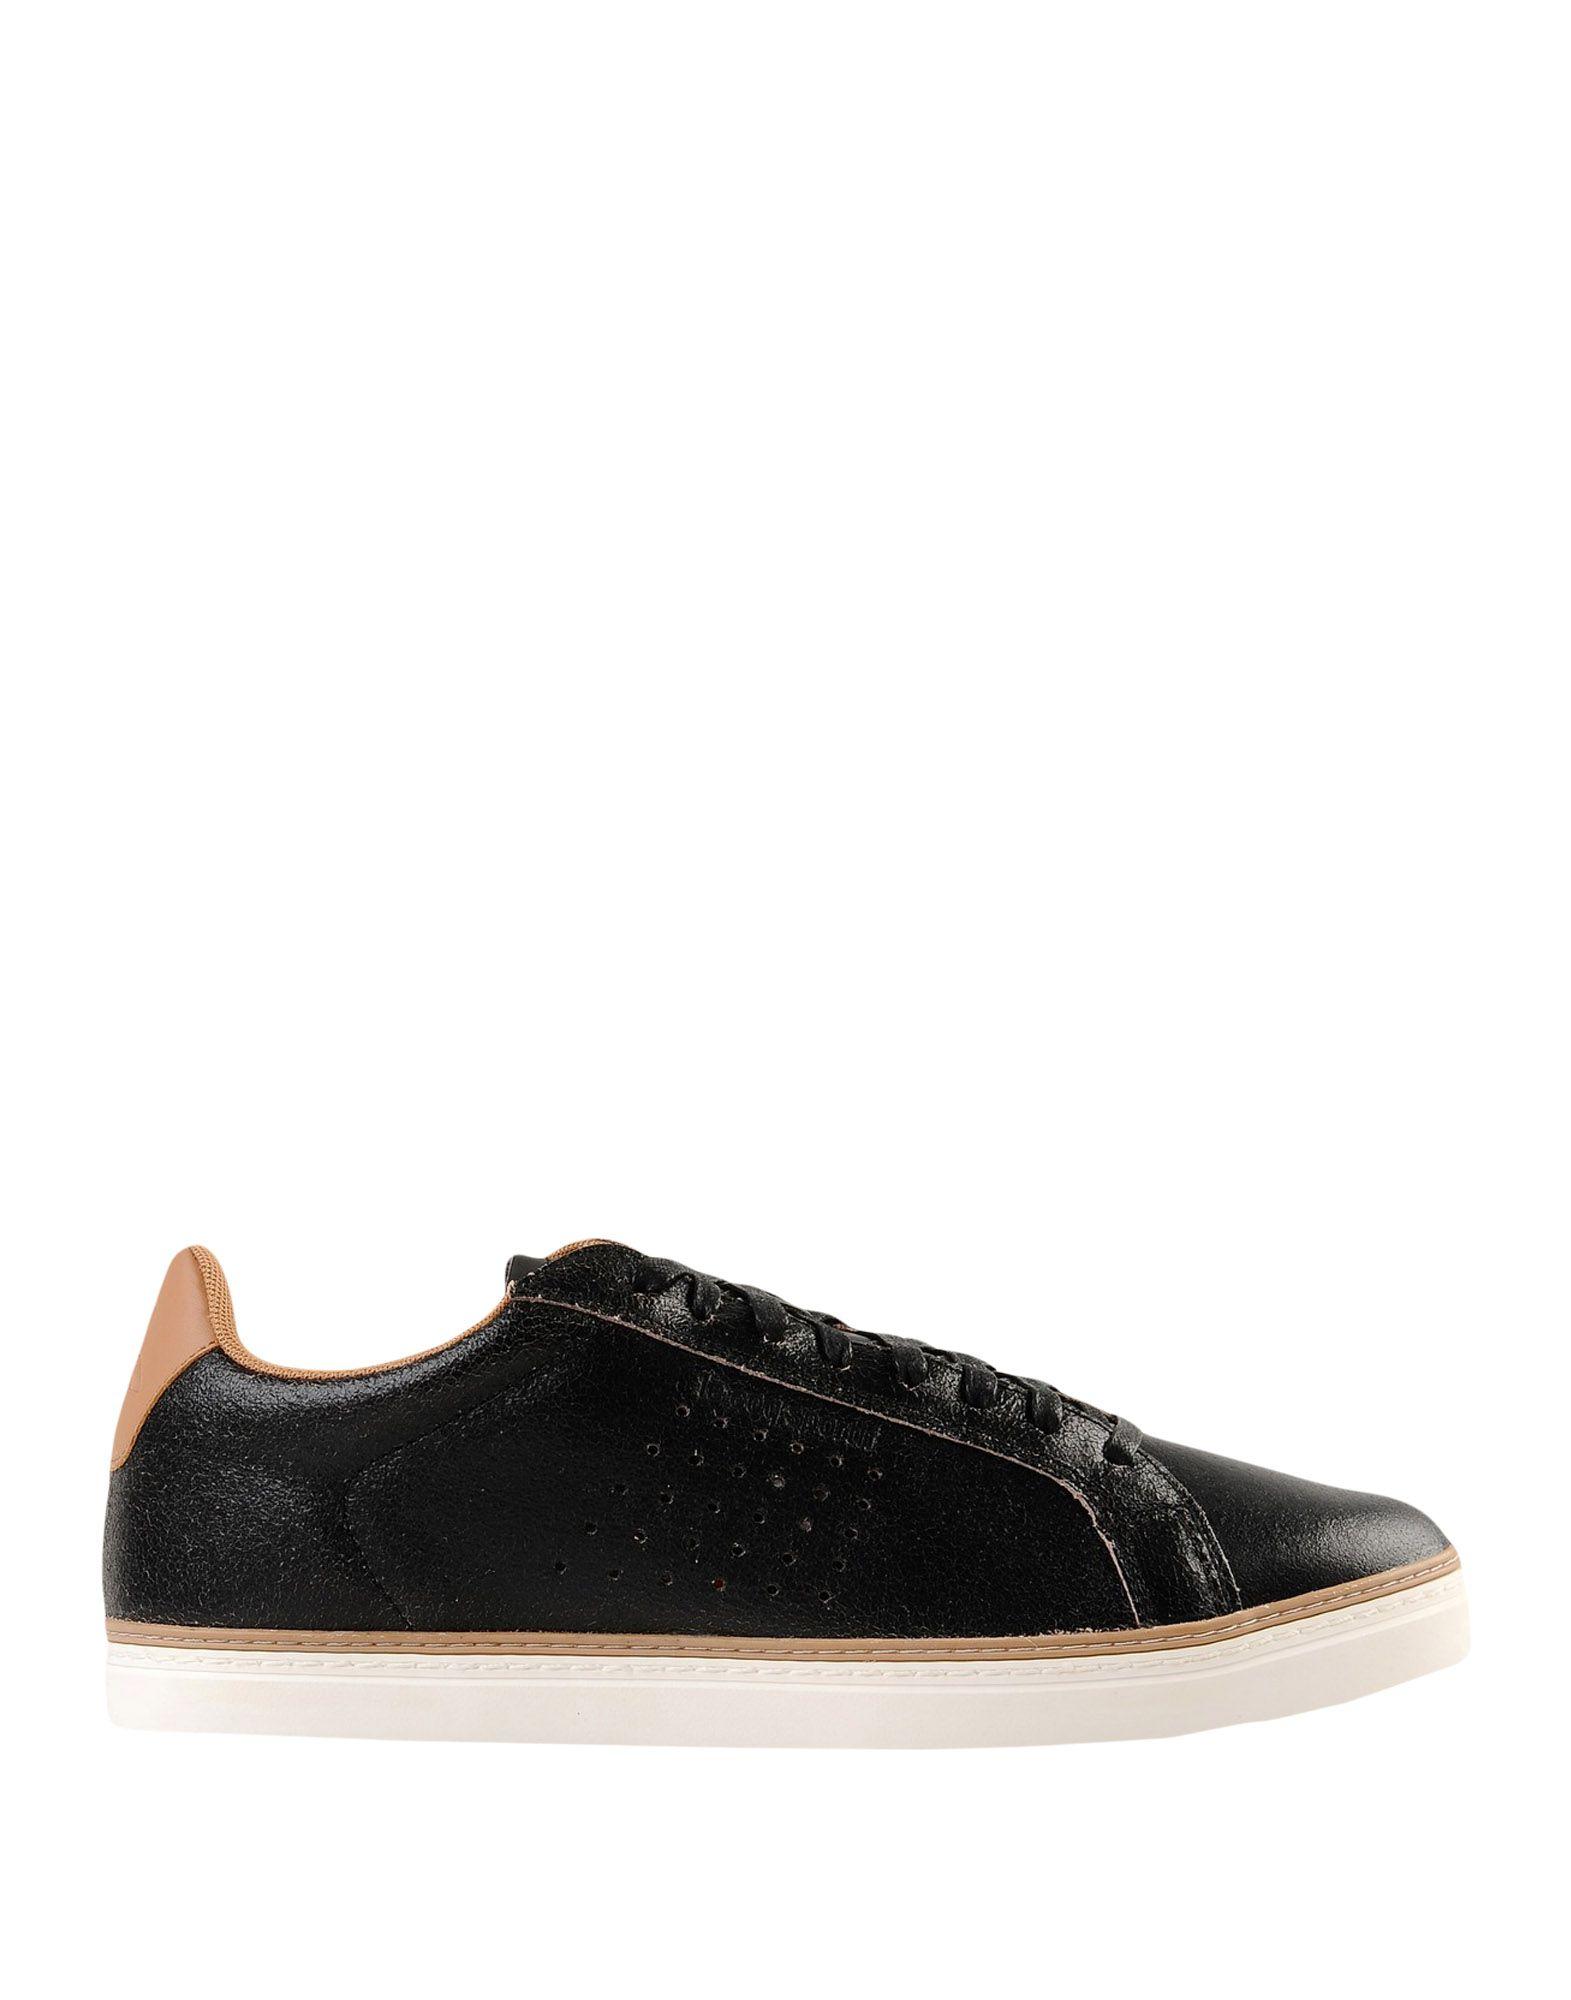 Rabatt echte Schuhe Le Coq Sportif  Courtace Premium Premium Premium Black/Brown Sugar  11555337WB bce8c7